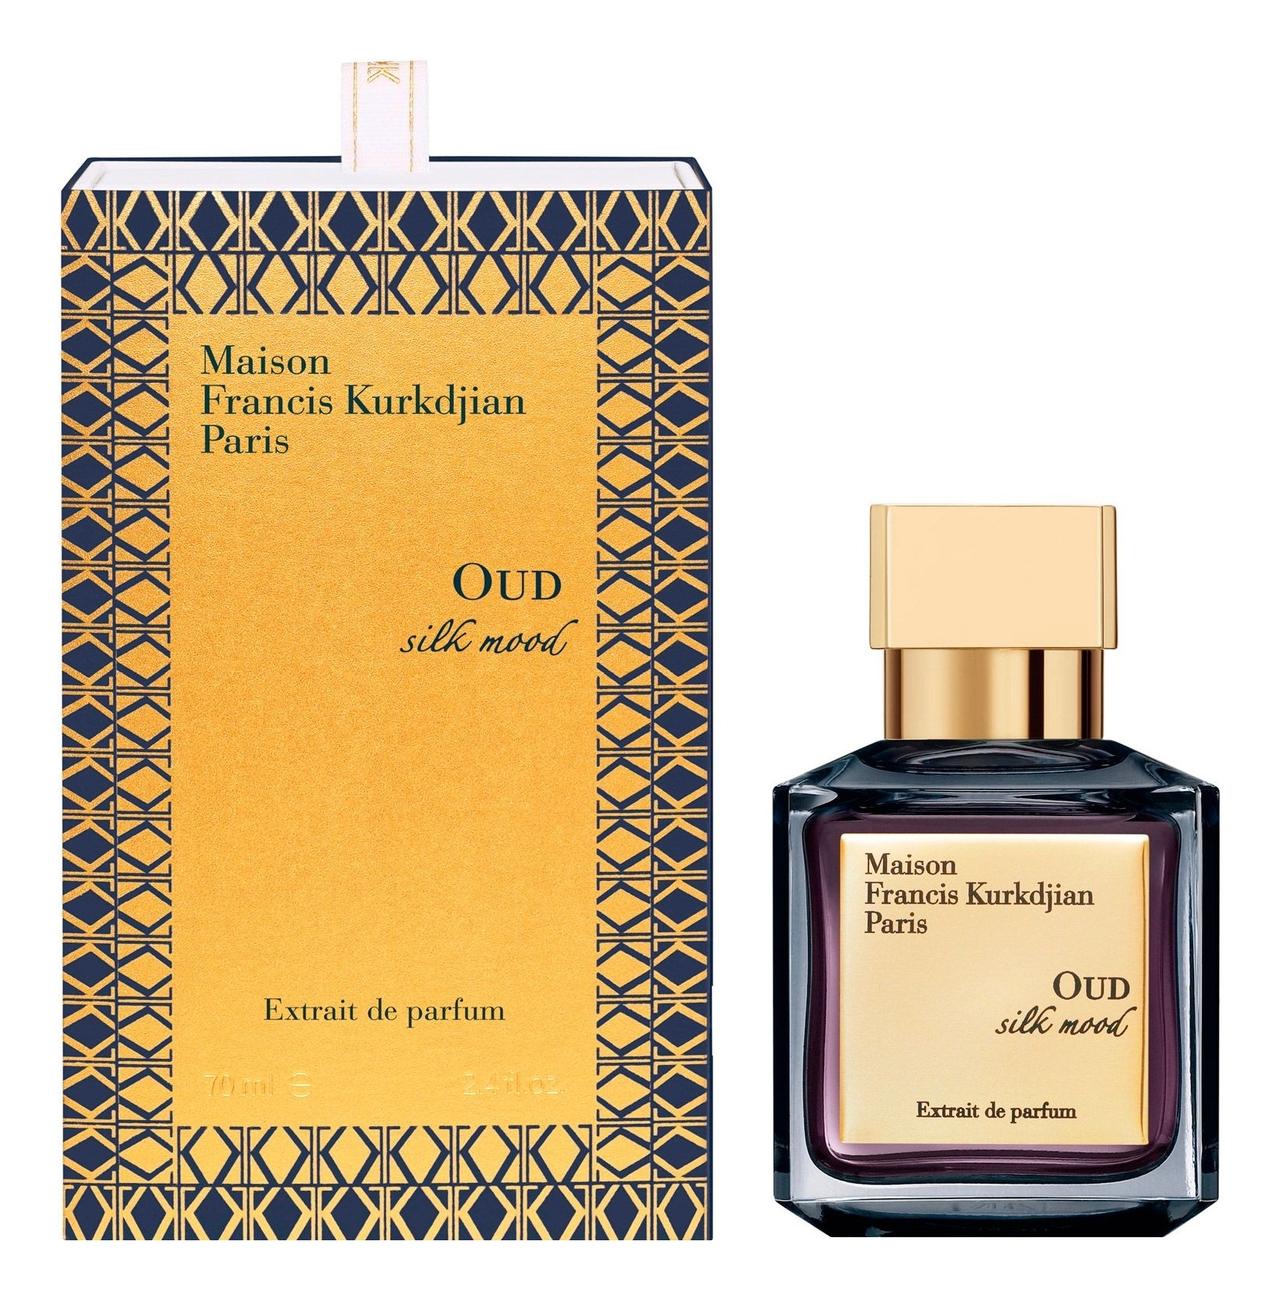 Francis Kurkdjian Oud Silk Mood: духи 70мл francis kurkdjian oud silk mood духи 70мл